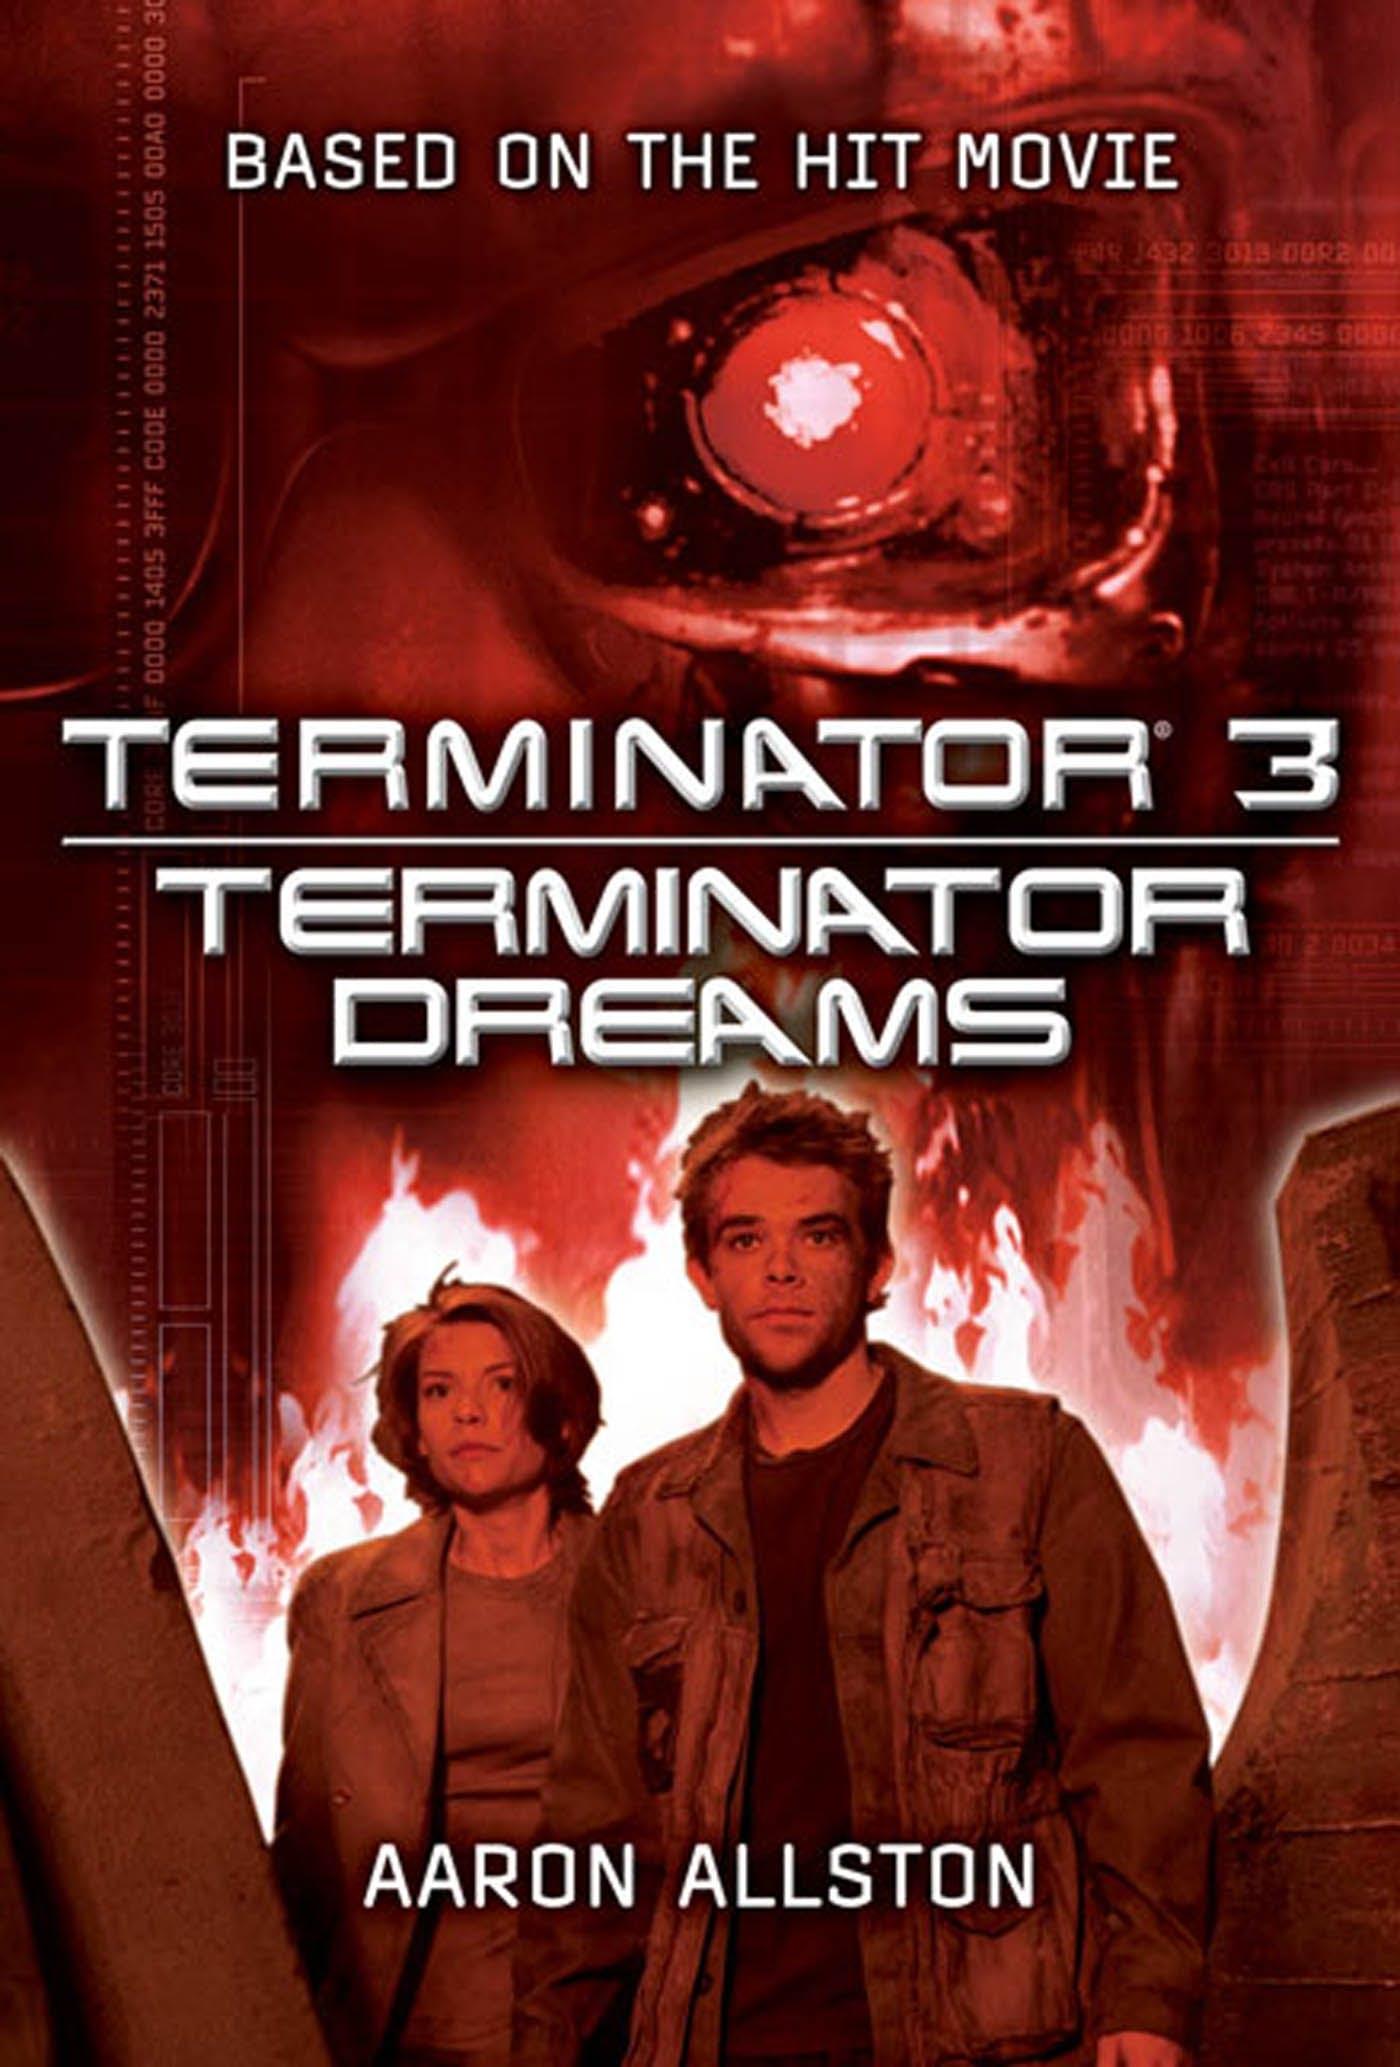 Image of Terminator 3: Terminator Dreams